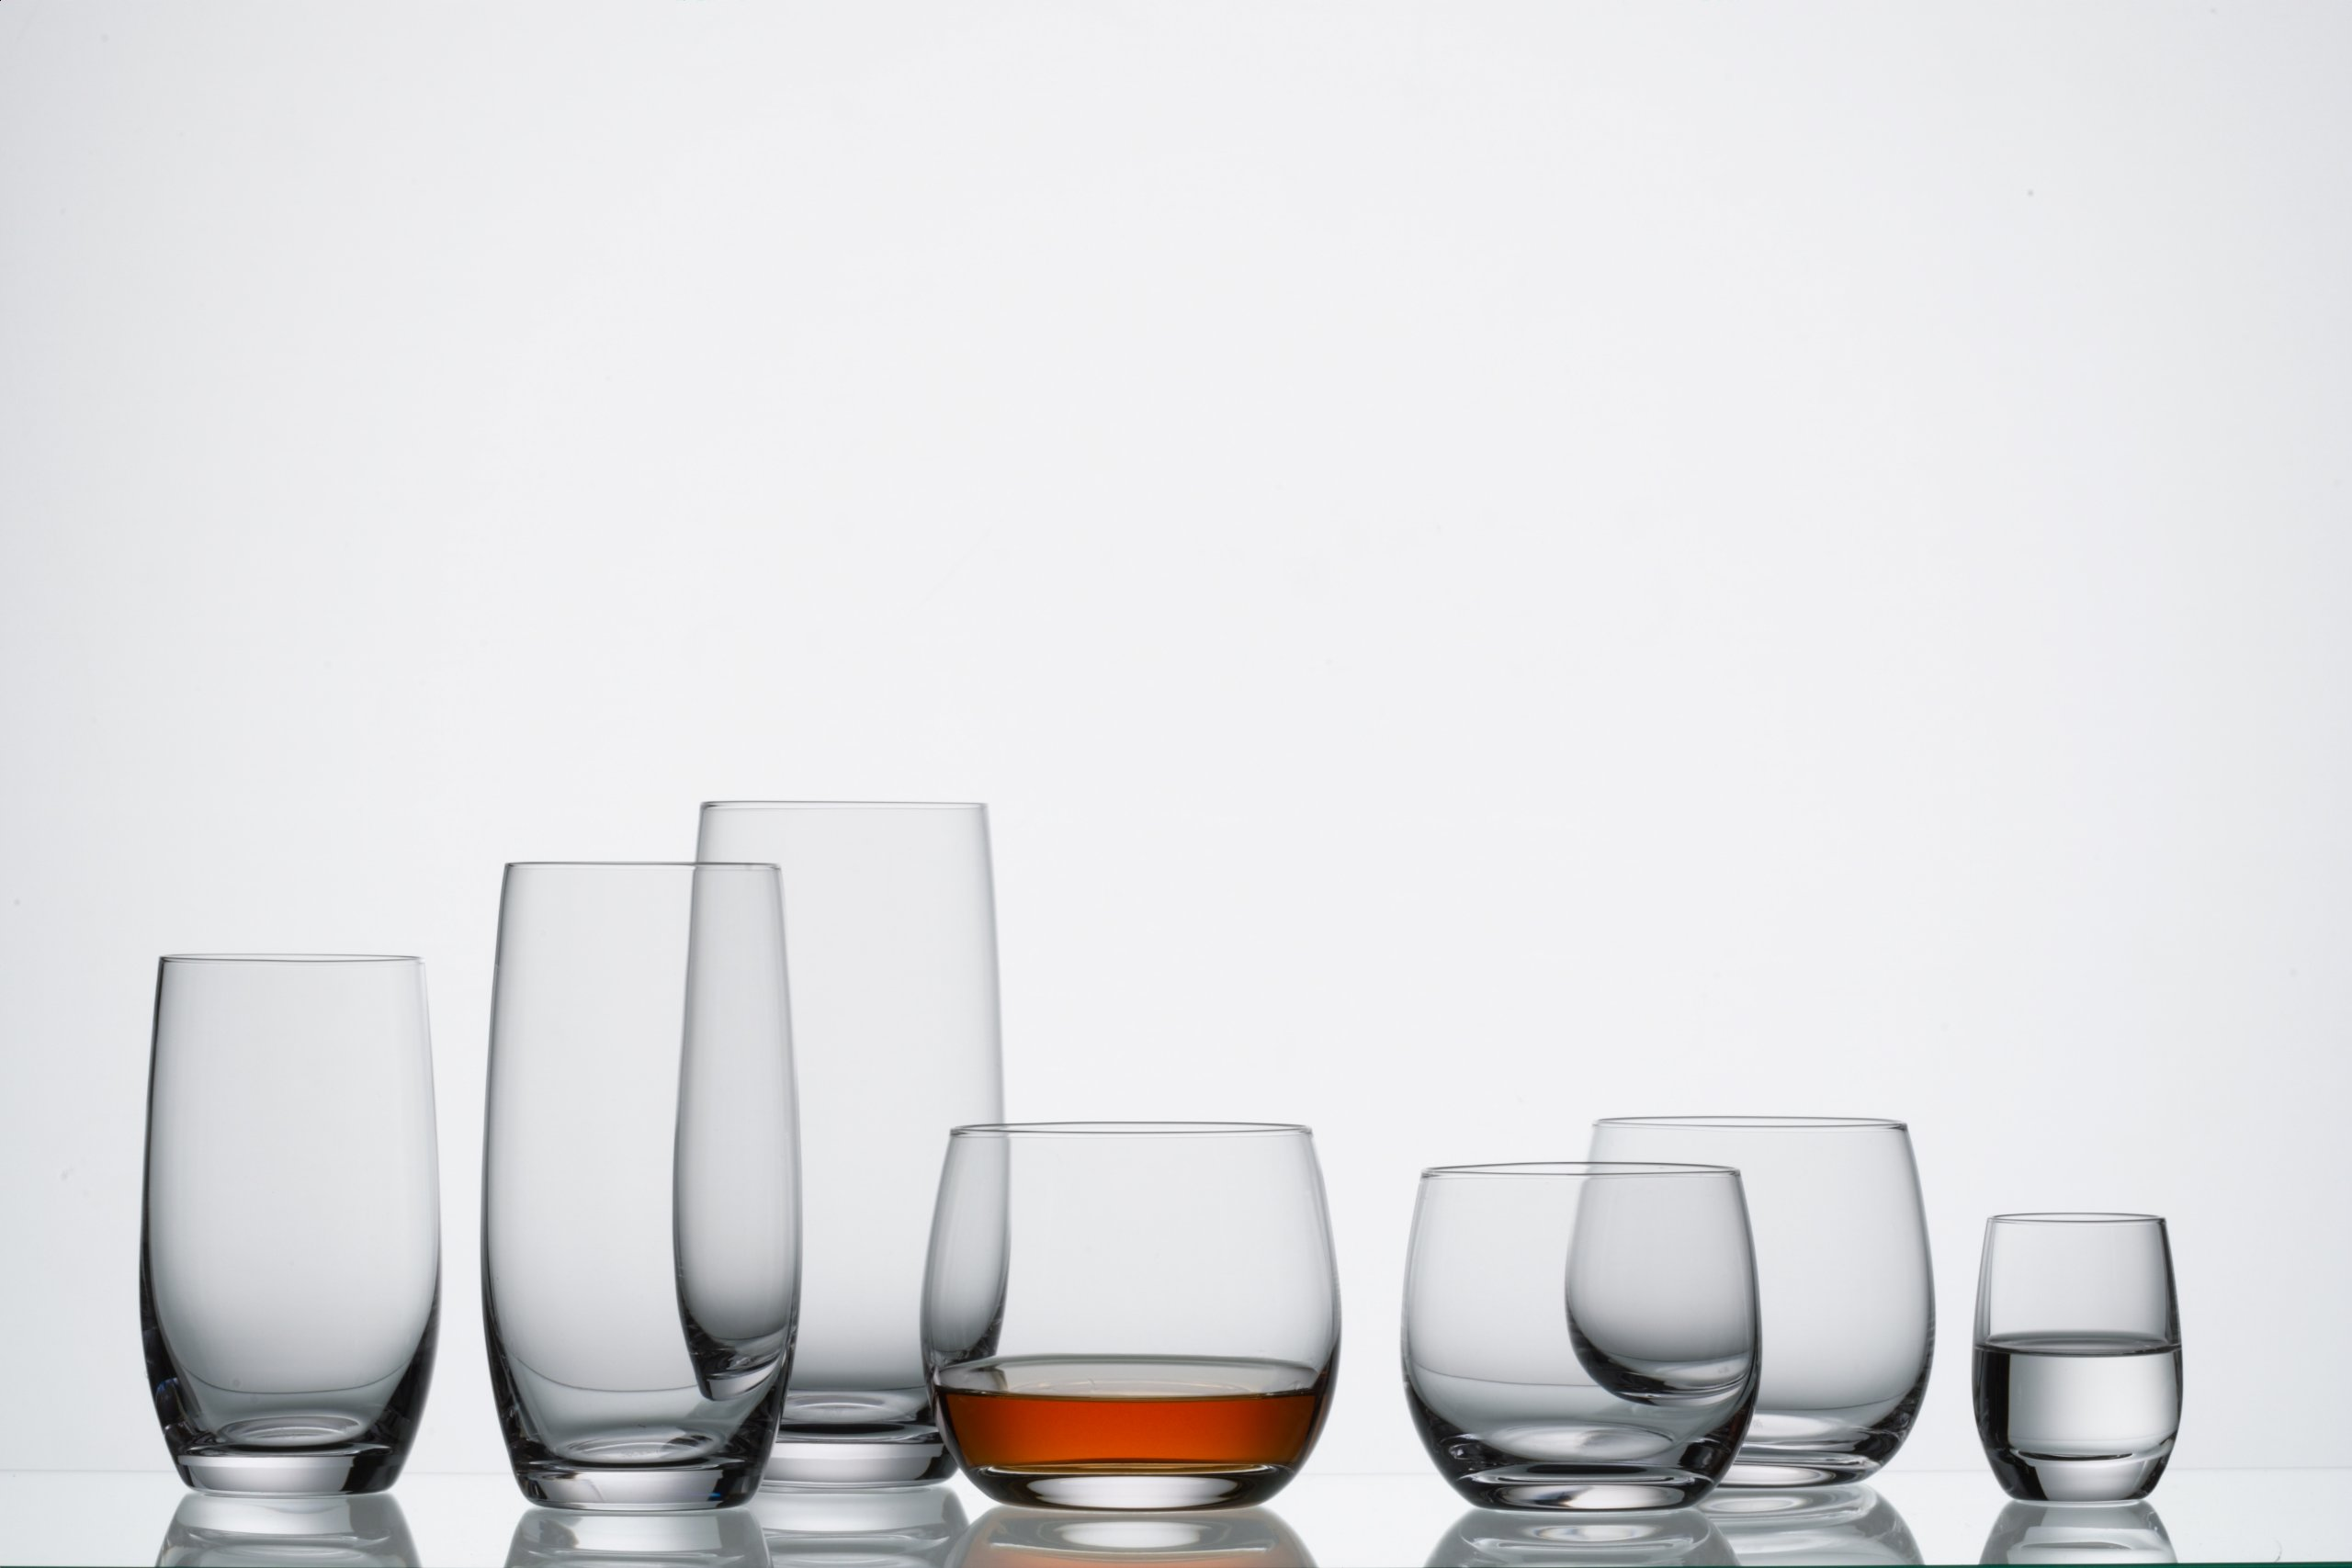 Schott Zwiesel Tritan Crystal Glass Banquet Barware Collection Beer Tumbler/Highball Cocktail Glass, 10.8-Ounce, Set of 6